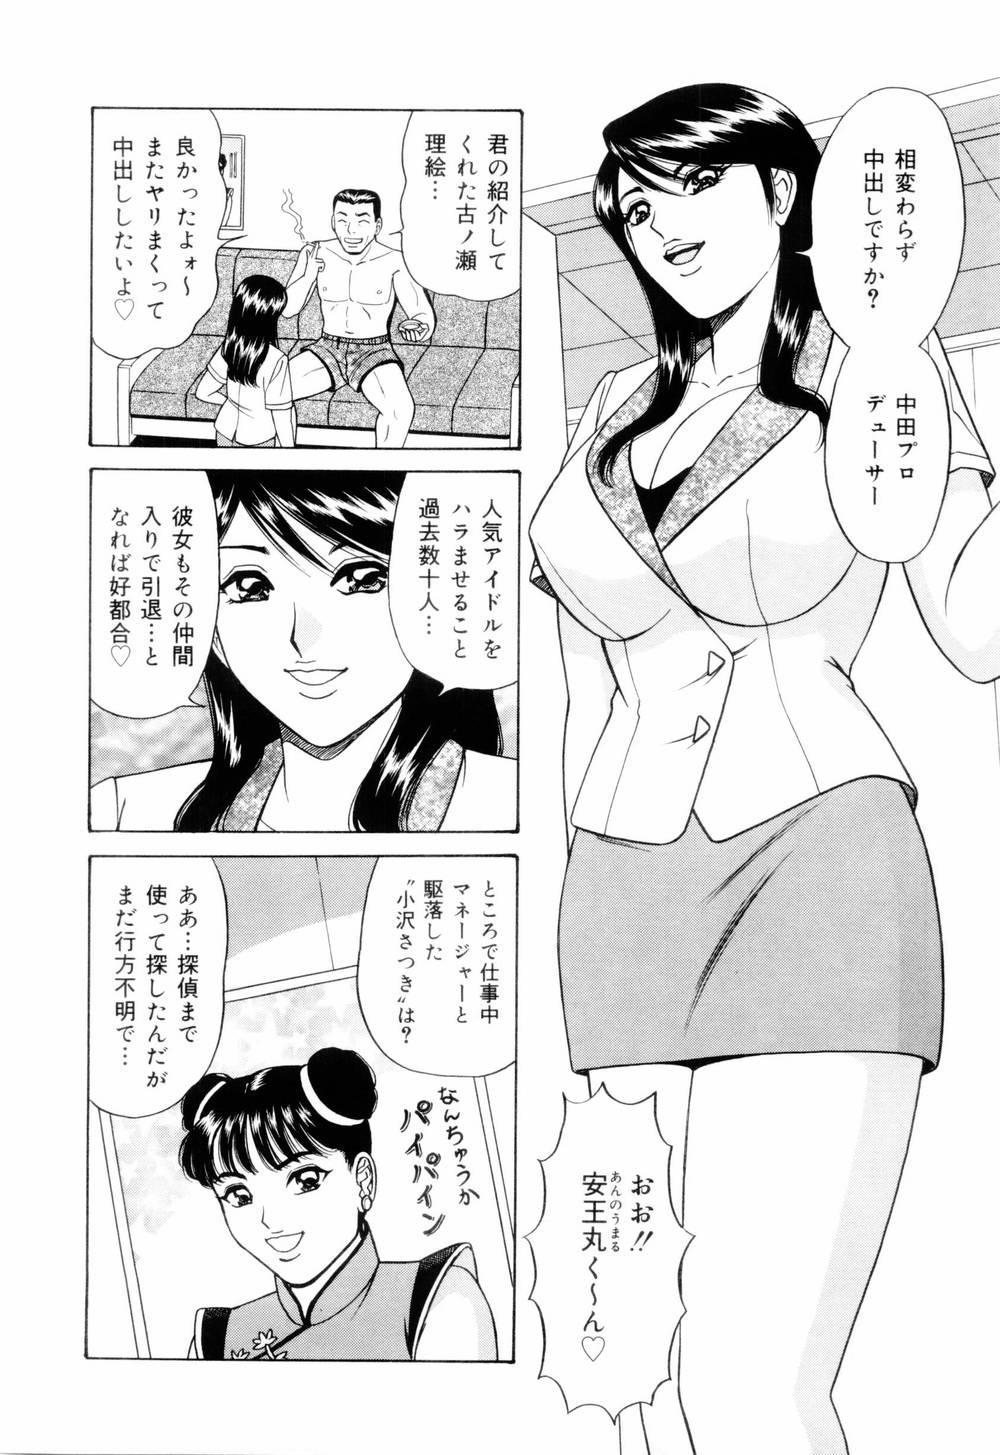 SuiCup Joshi Announcer Jikkyo Chukei Rape 79